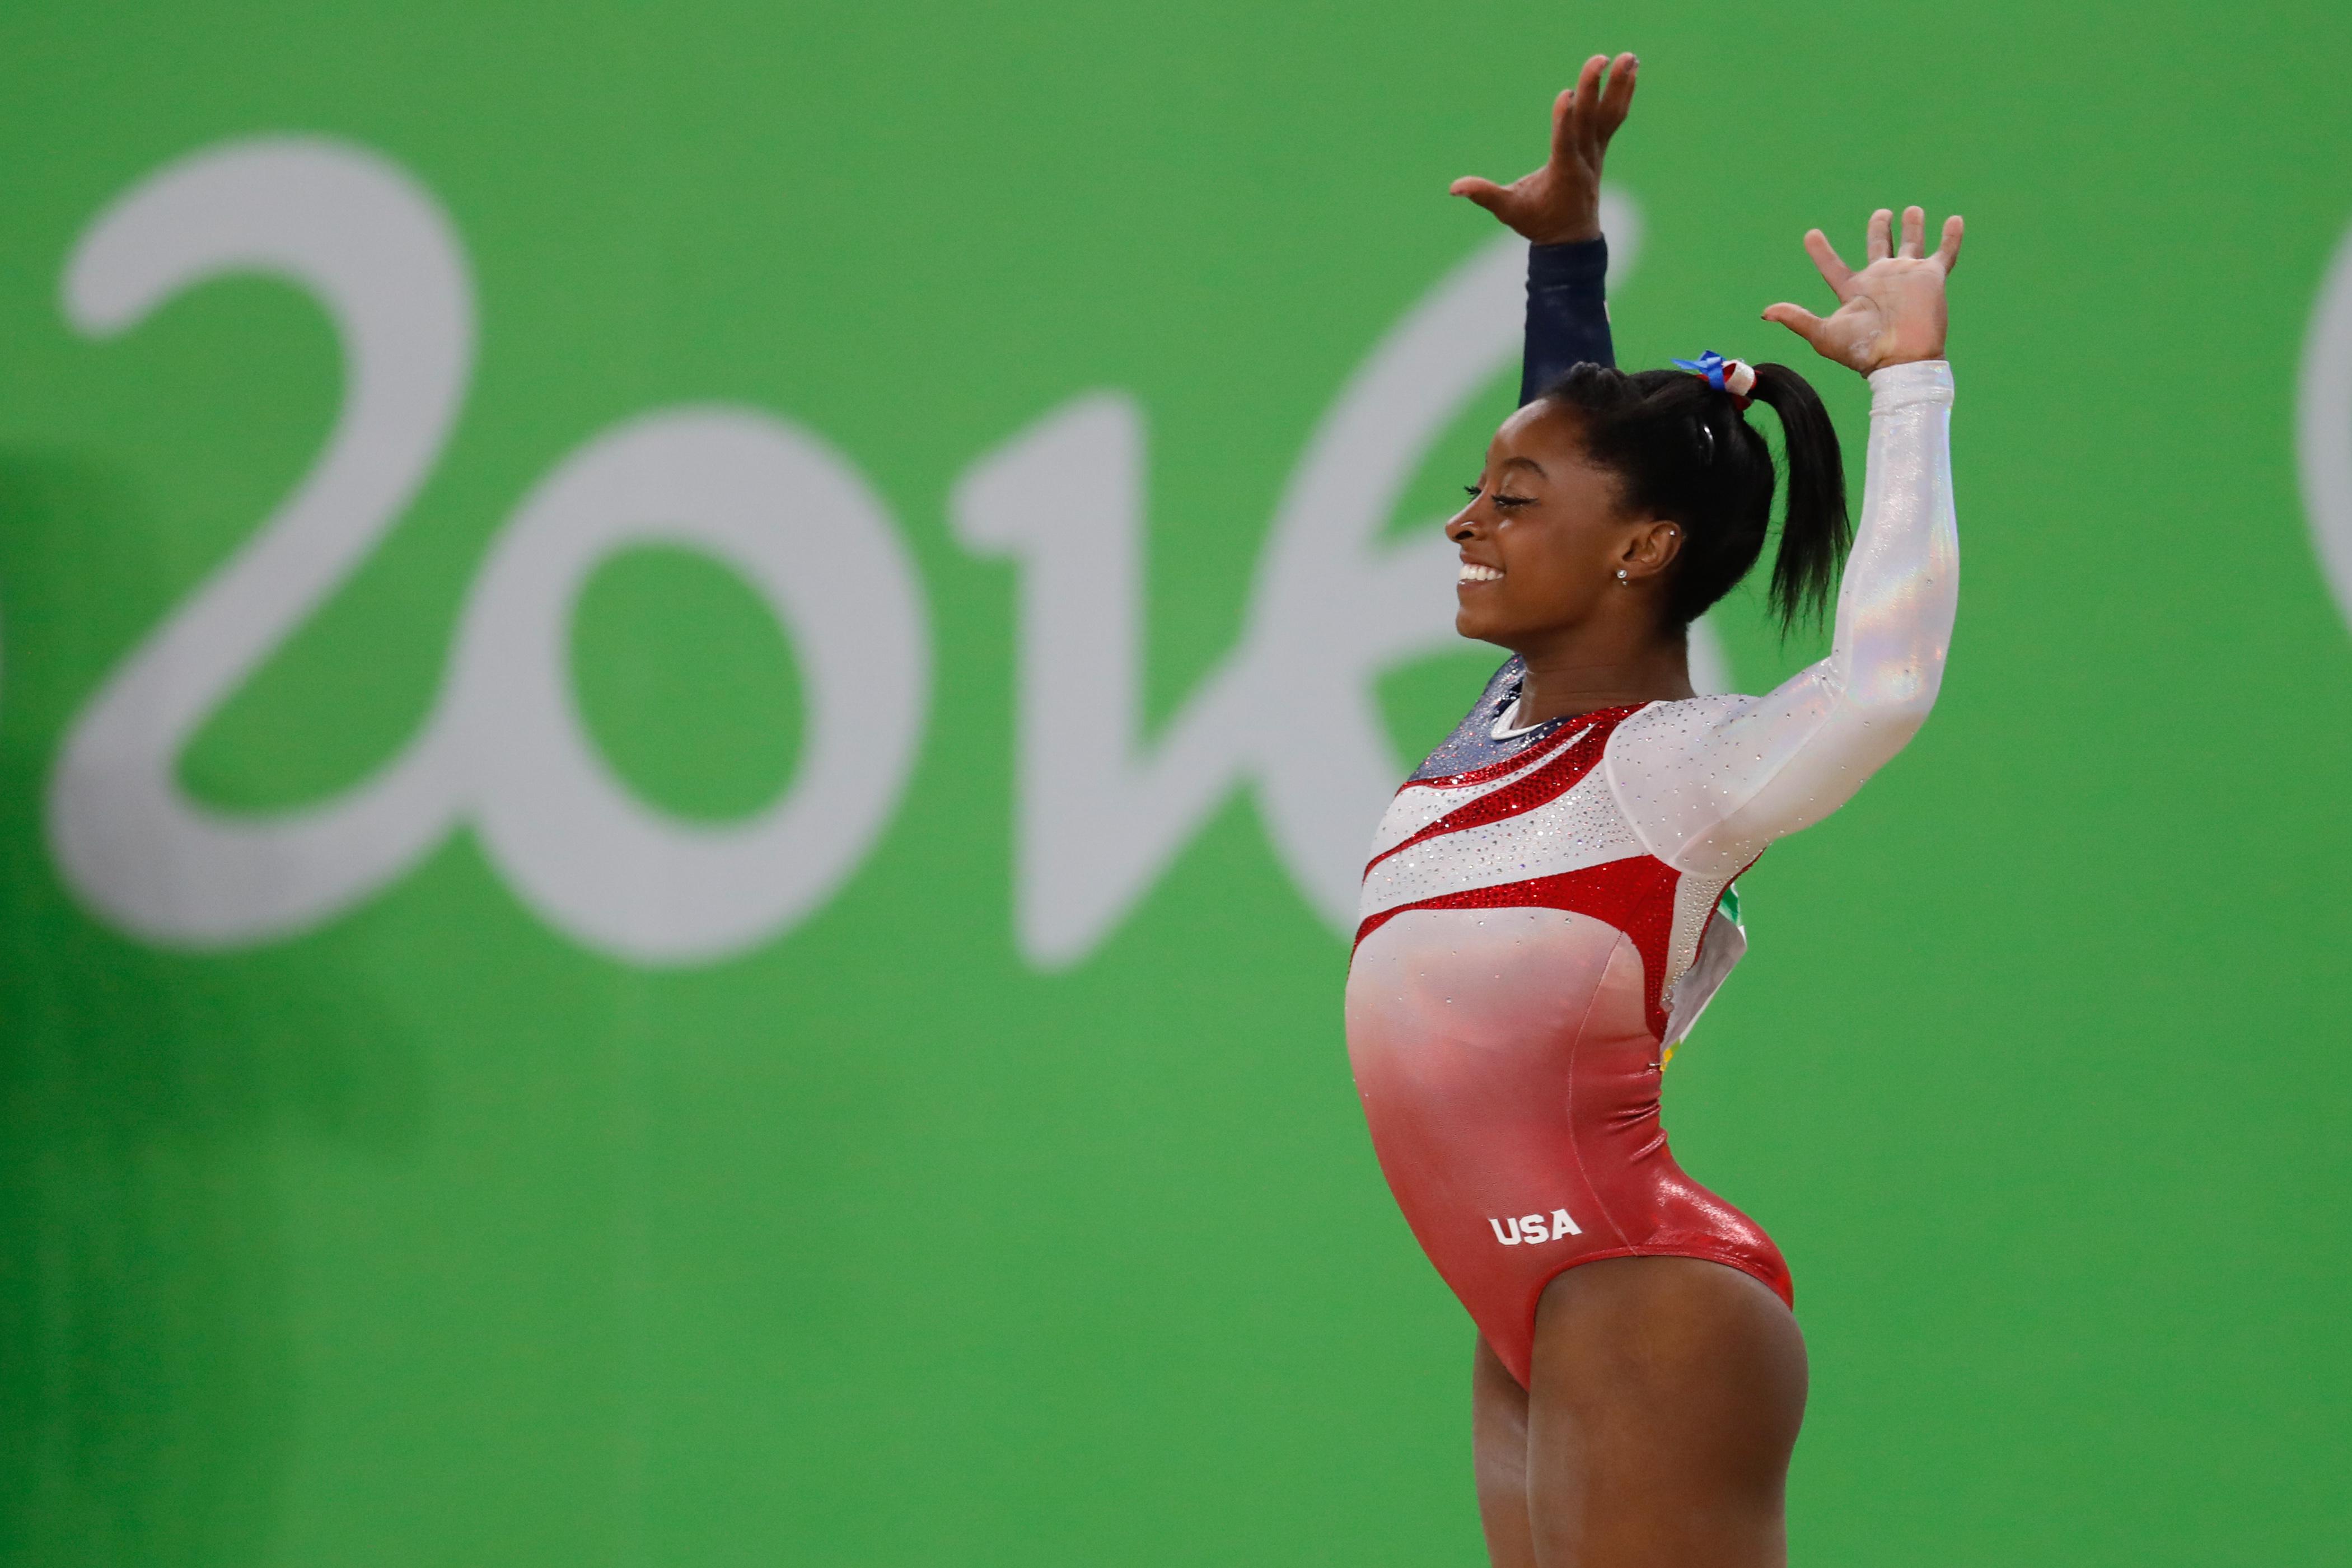 Olympics: Simone Biles Withdraws, 13 Y.O. Skateboarder Wins Gold